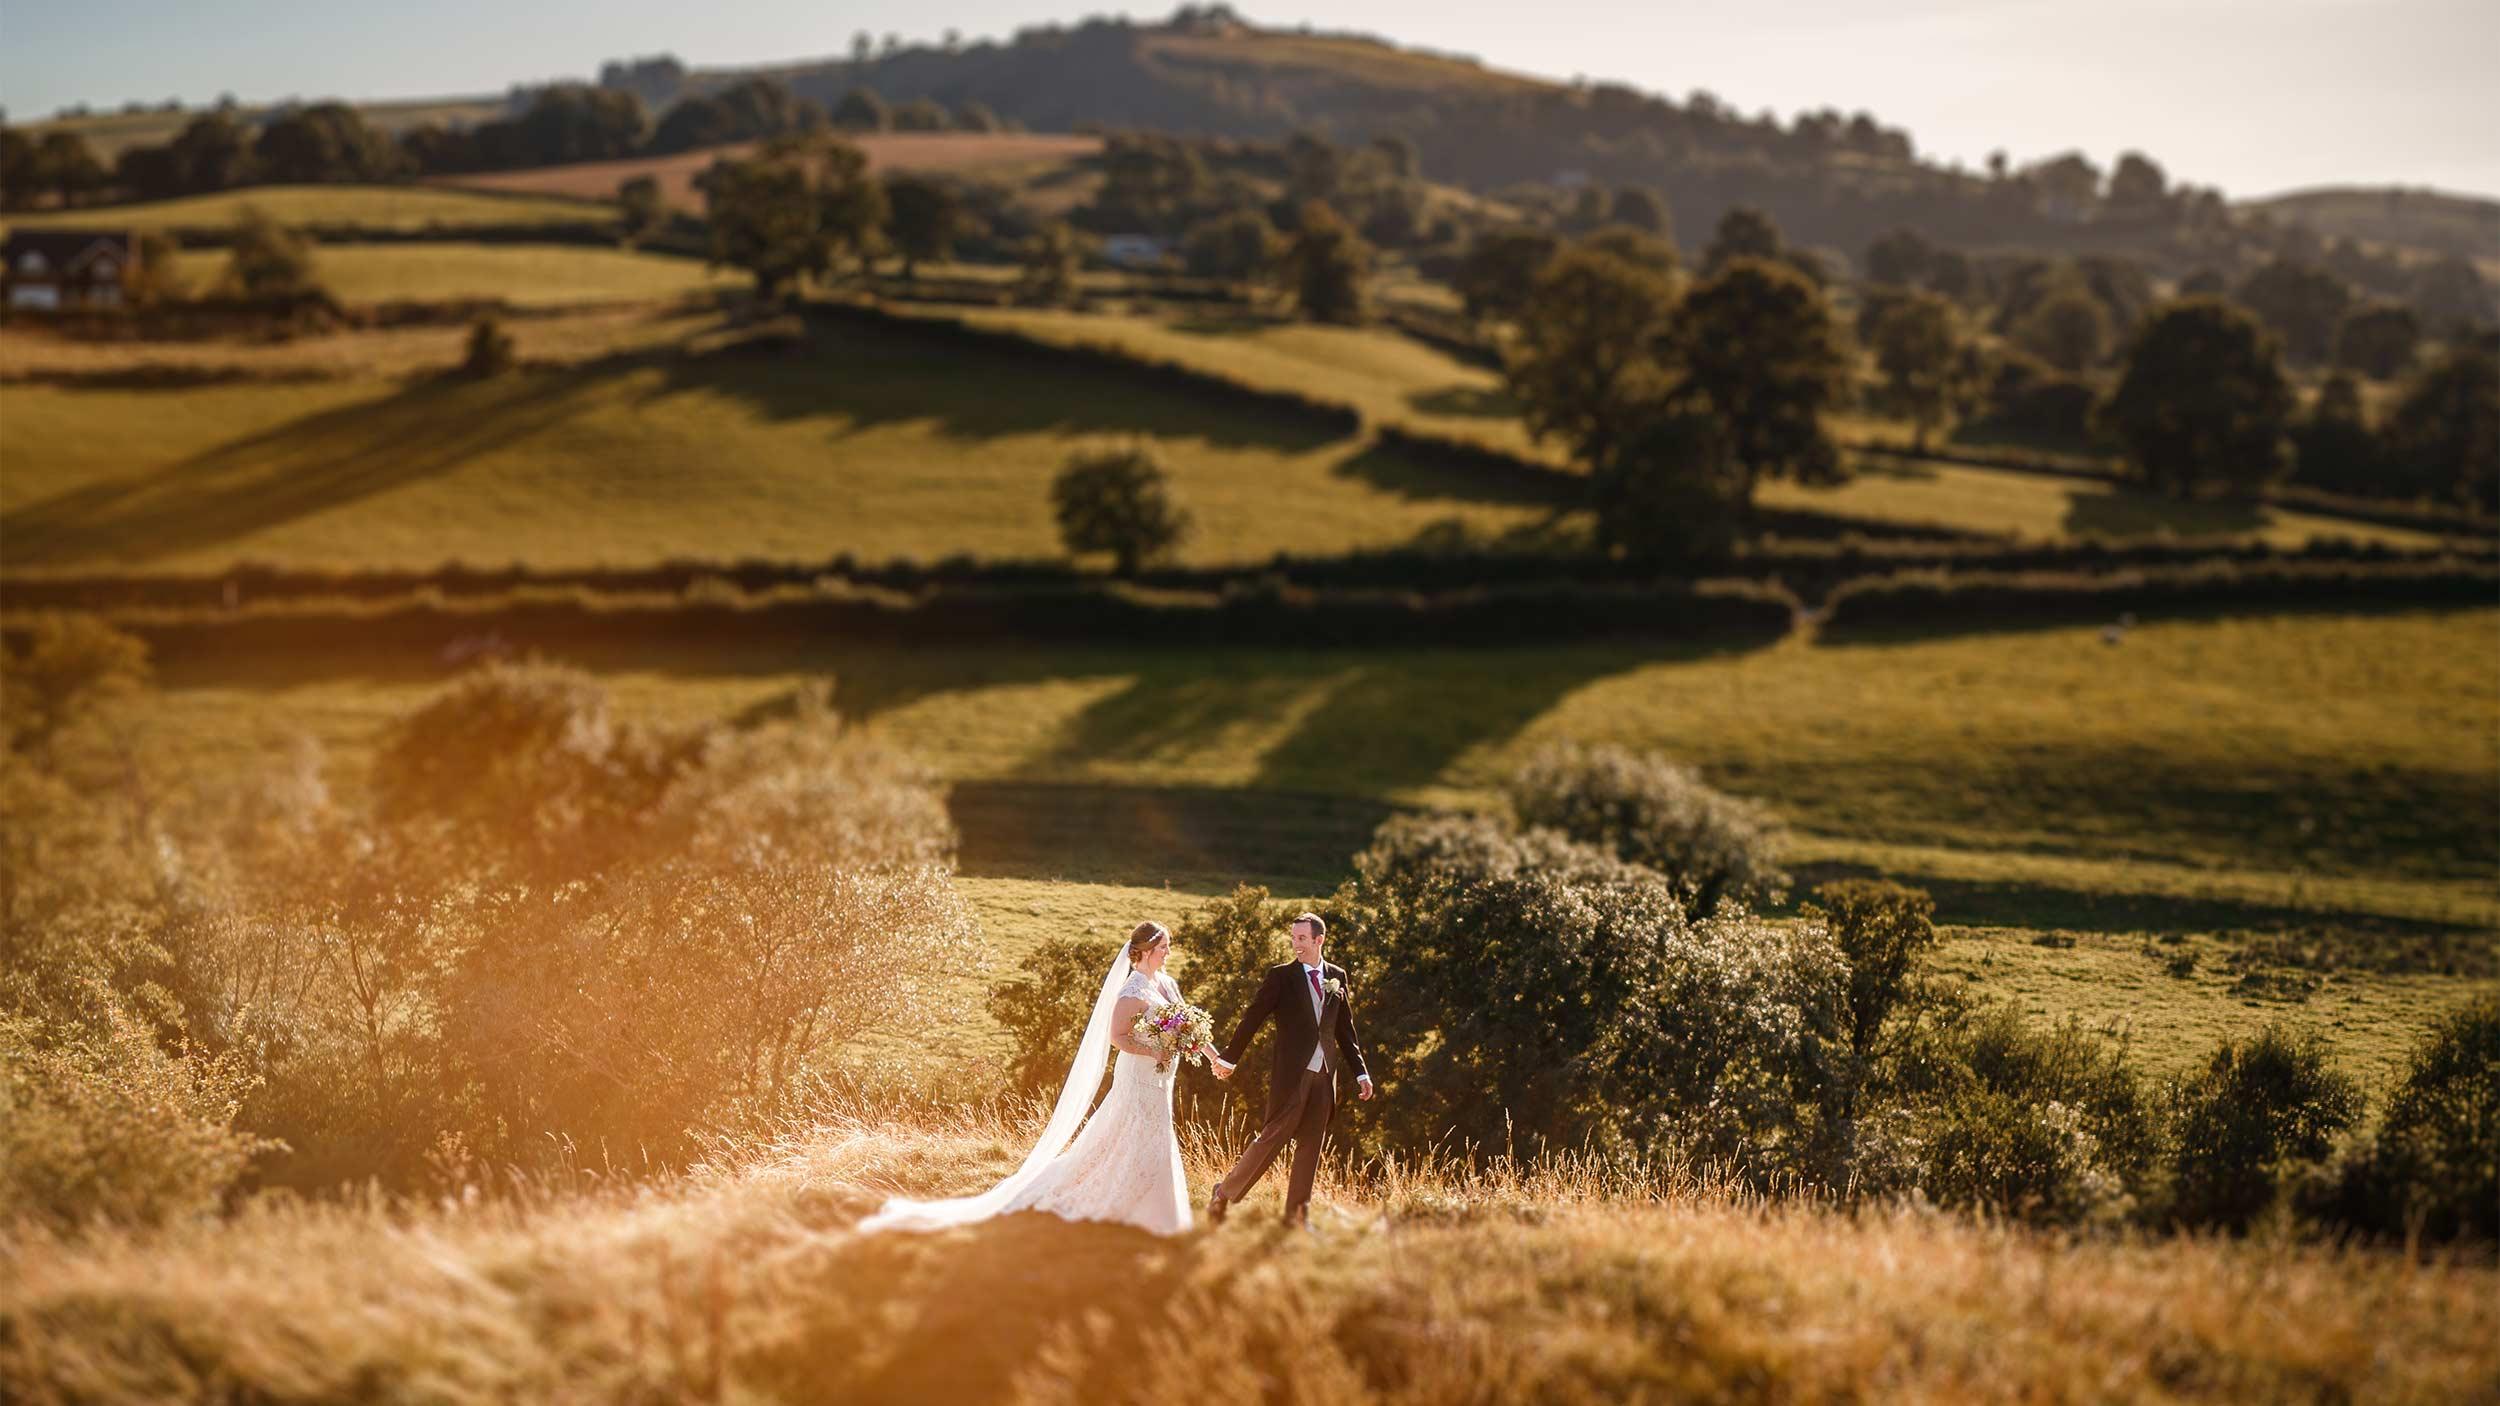 Herefordshire Wedding Photographer, Westmidlands, Weddings